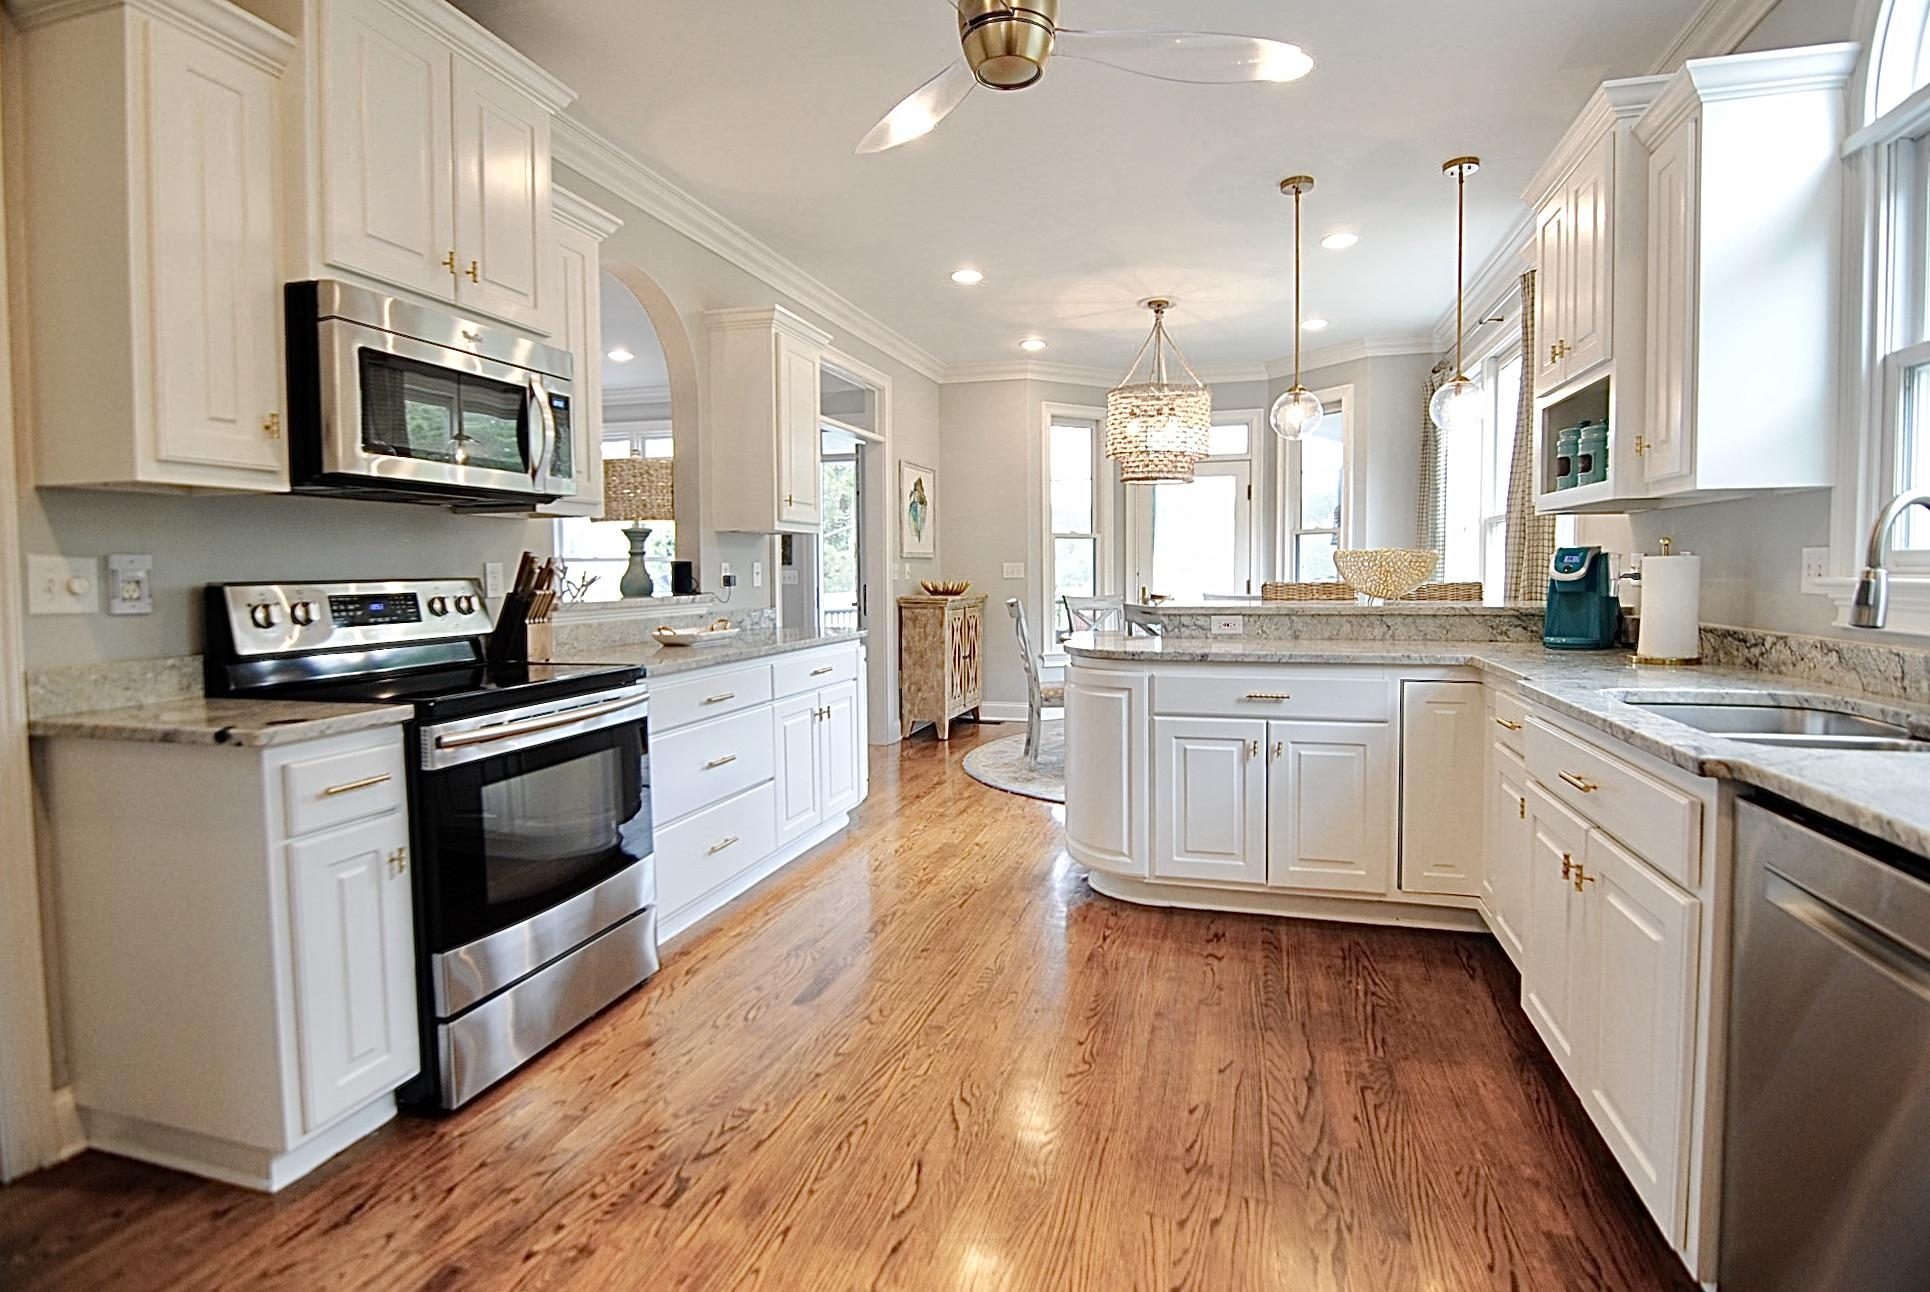 Hobcaw Creek Plantation Homes For Sale - 1513 Strathmore, Mount Pleasant, SC - 19